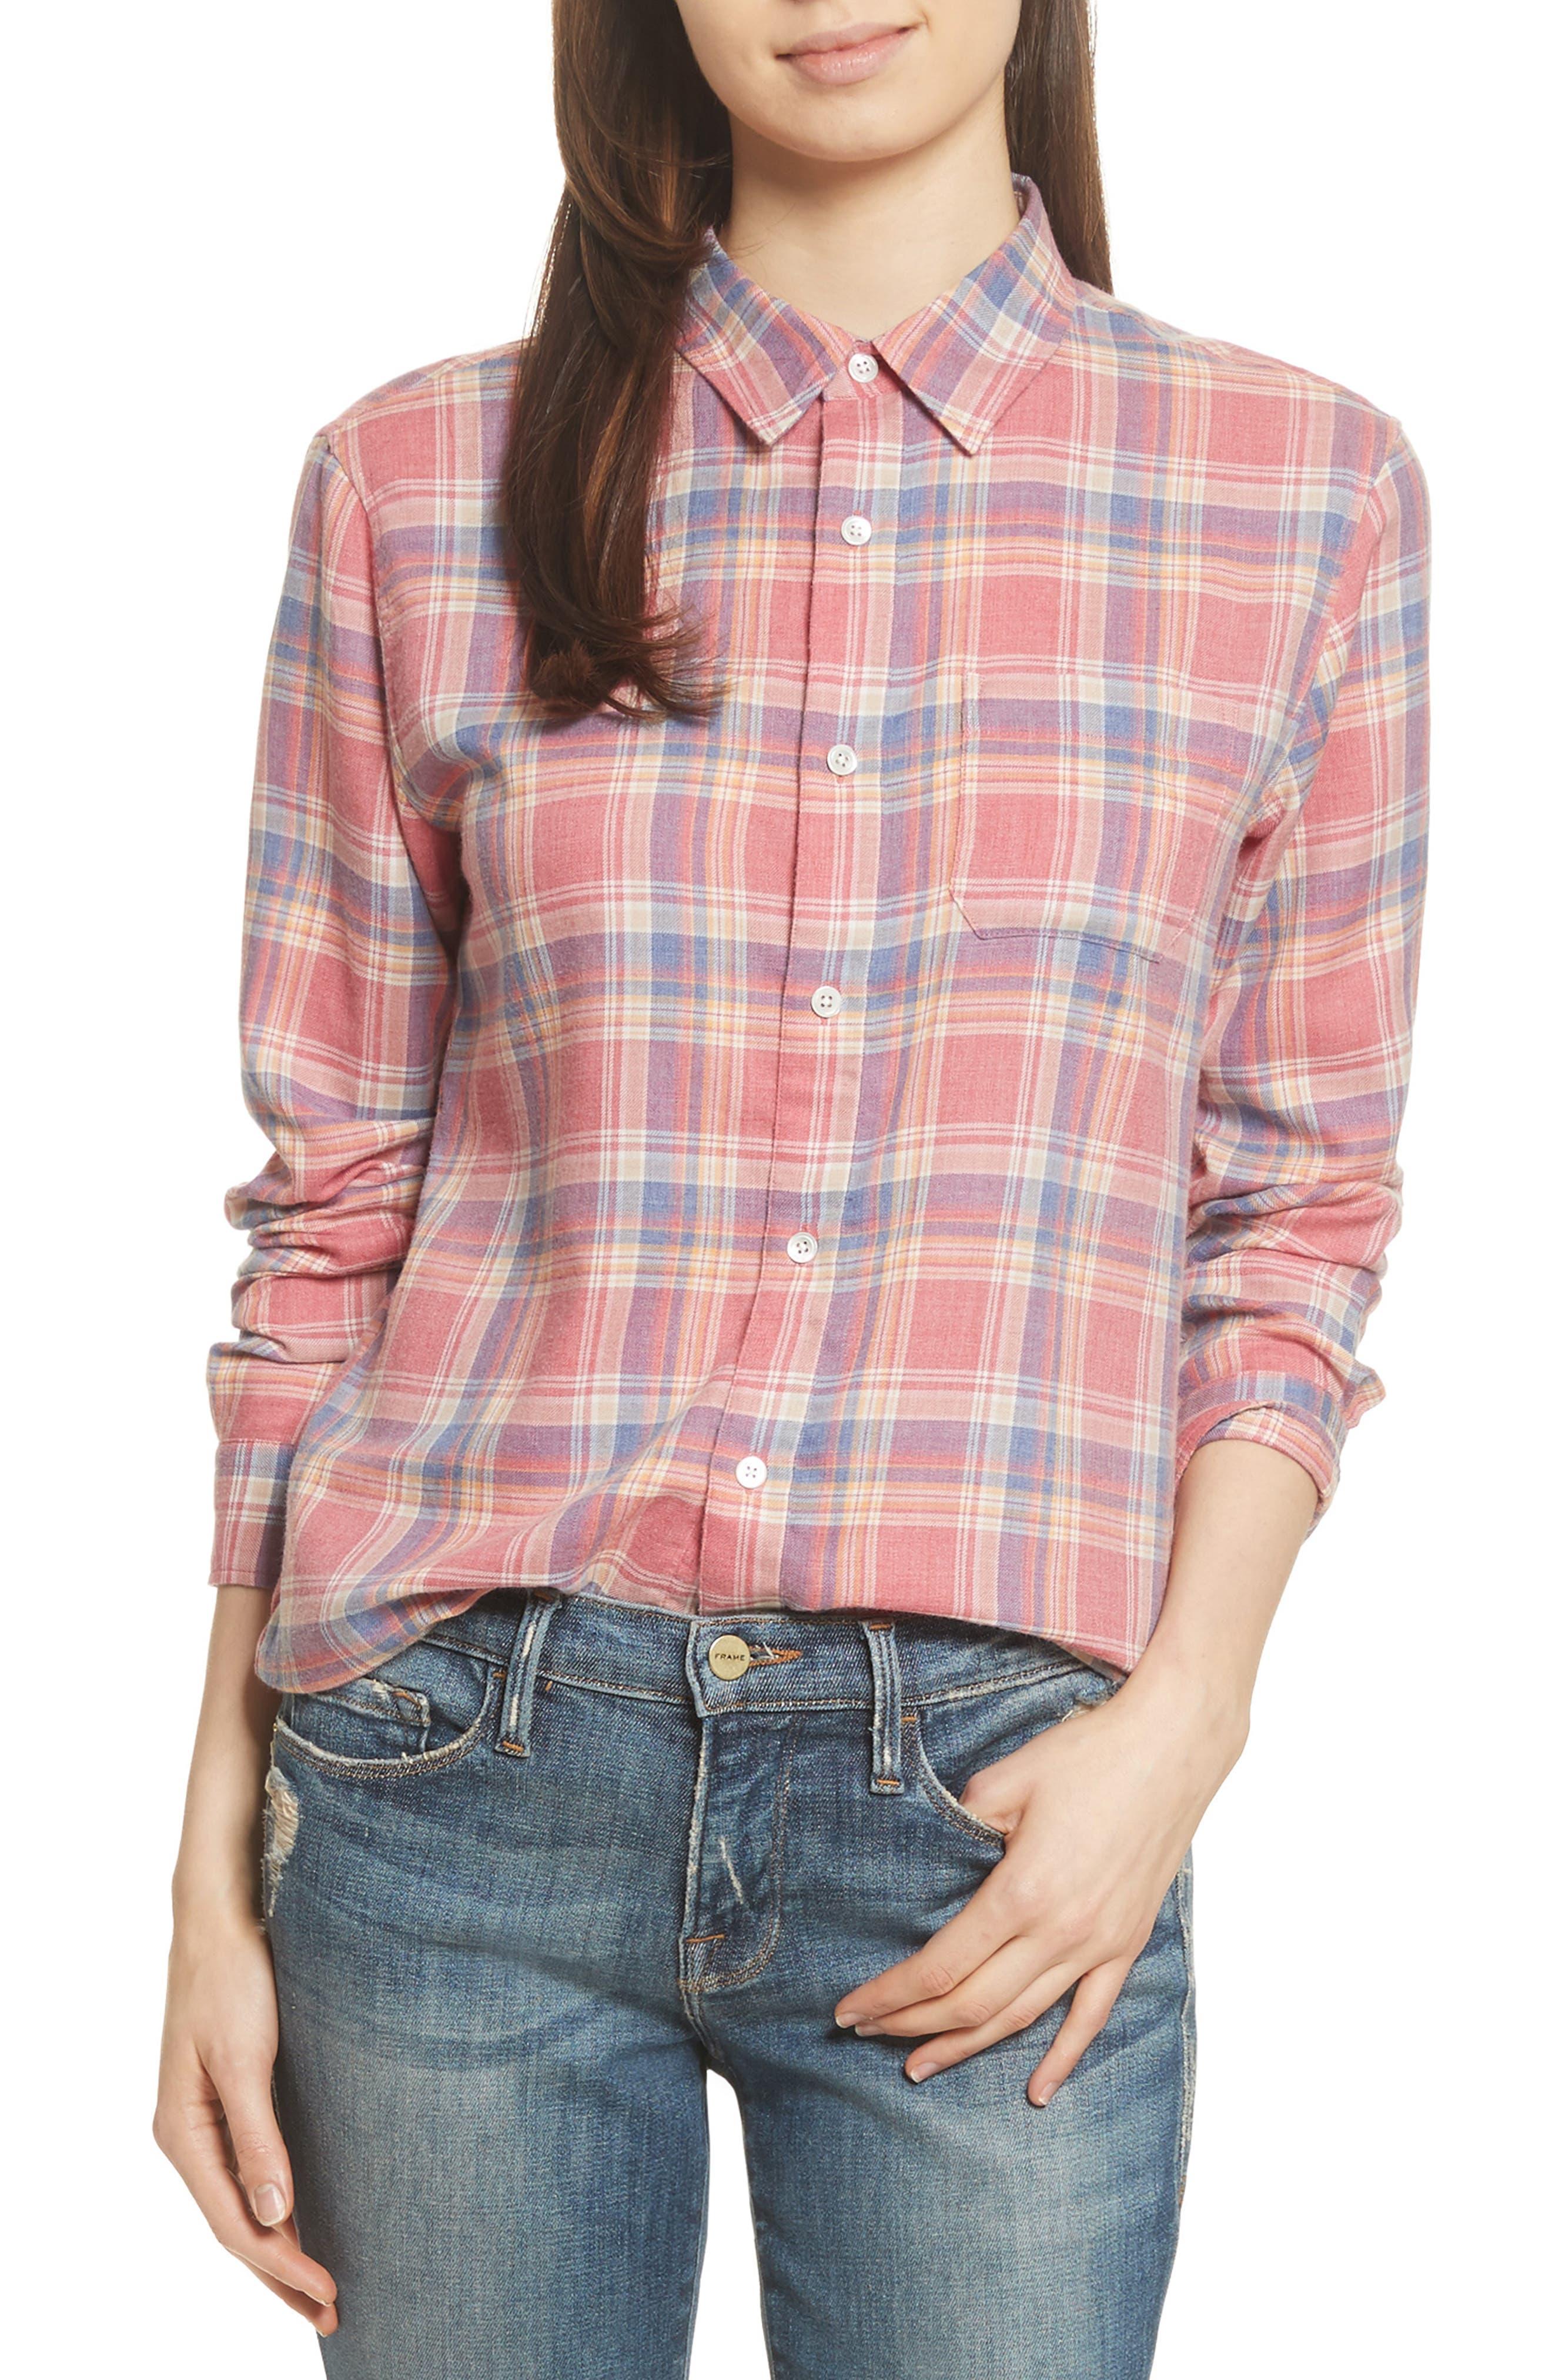 True Plaid Shirt,                             Main thumbnail 1, color,                             601